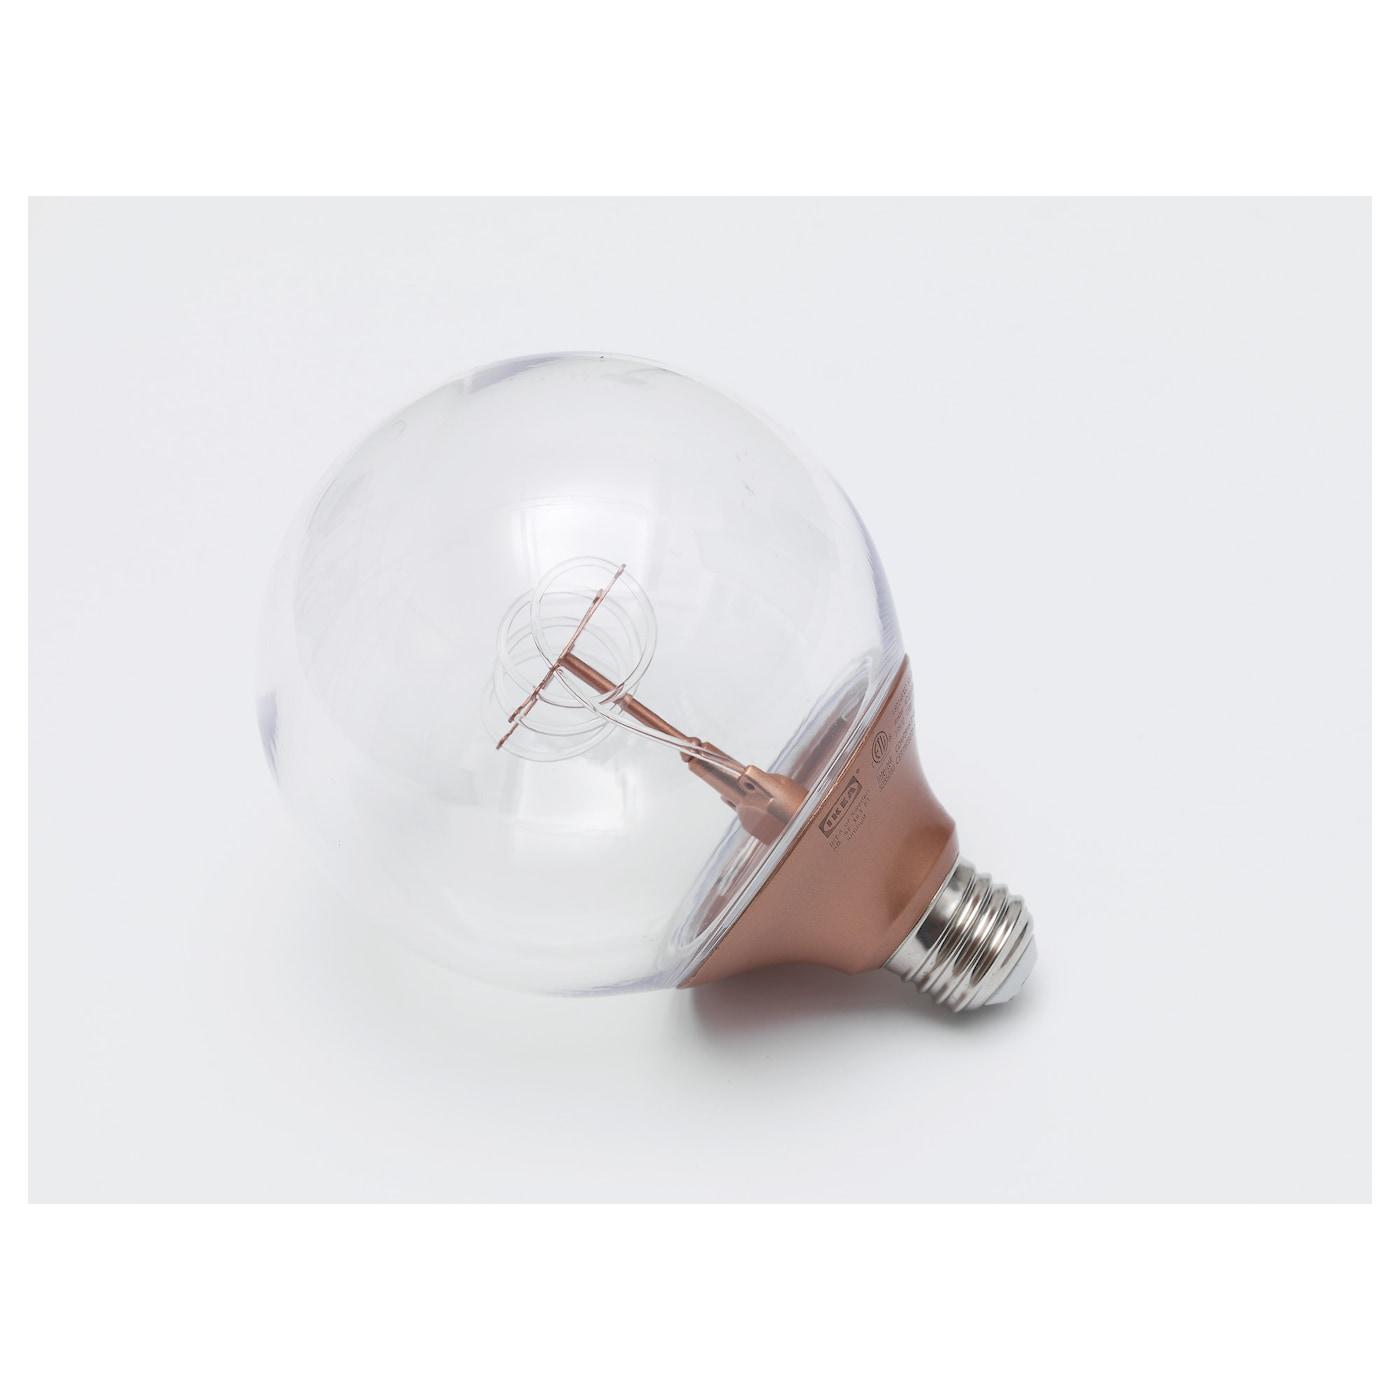 "Dressing De Coin Ikea nittio led bulb e26 20 lumen - globe copper color 5 "" (120 mm)"